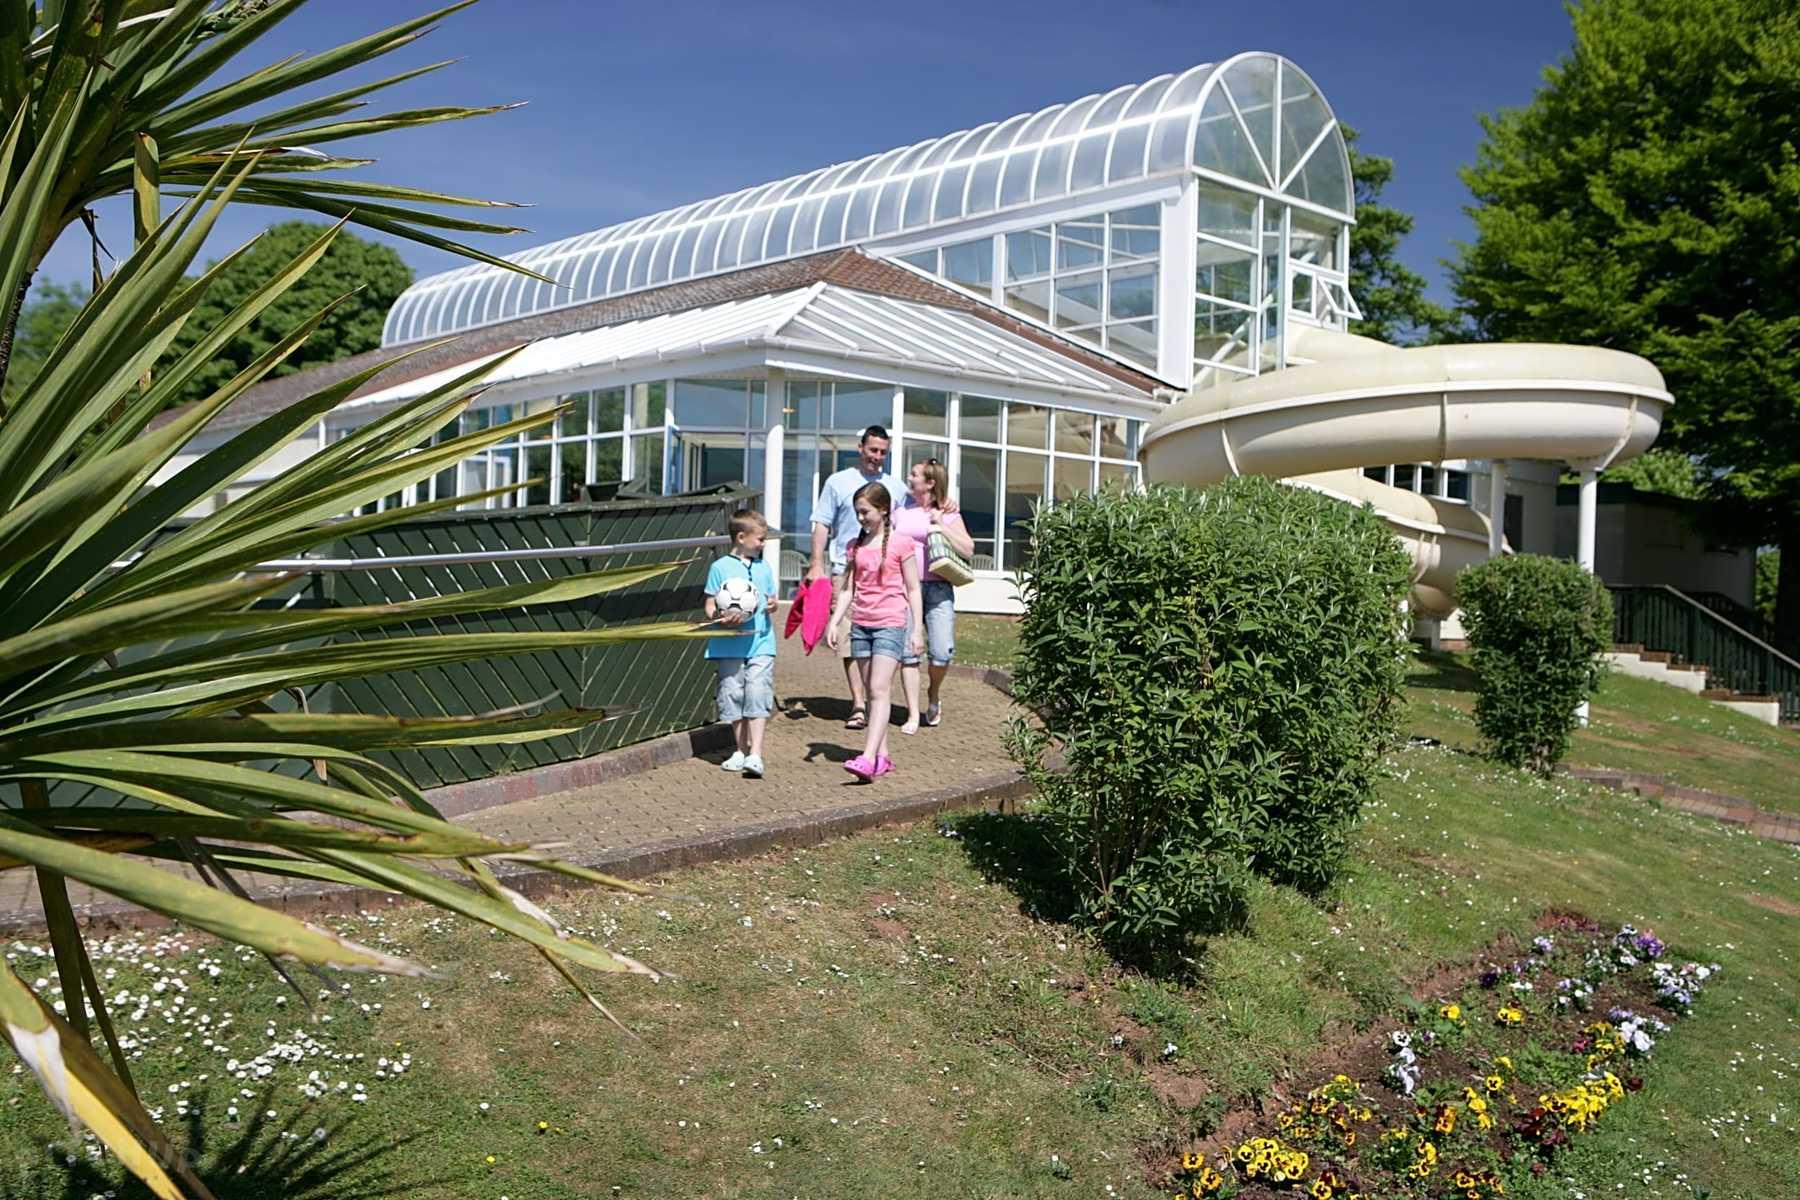 Torquay Holiday Park, Torquay - Pitchup®